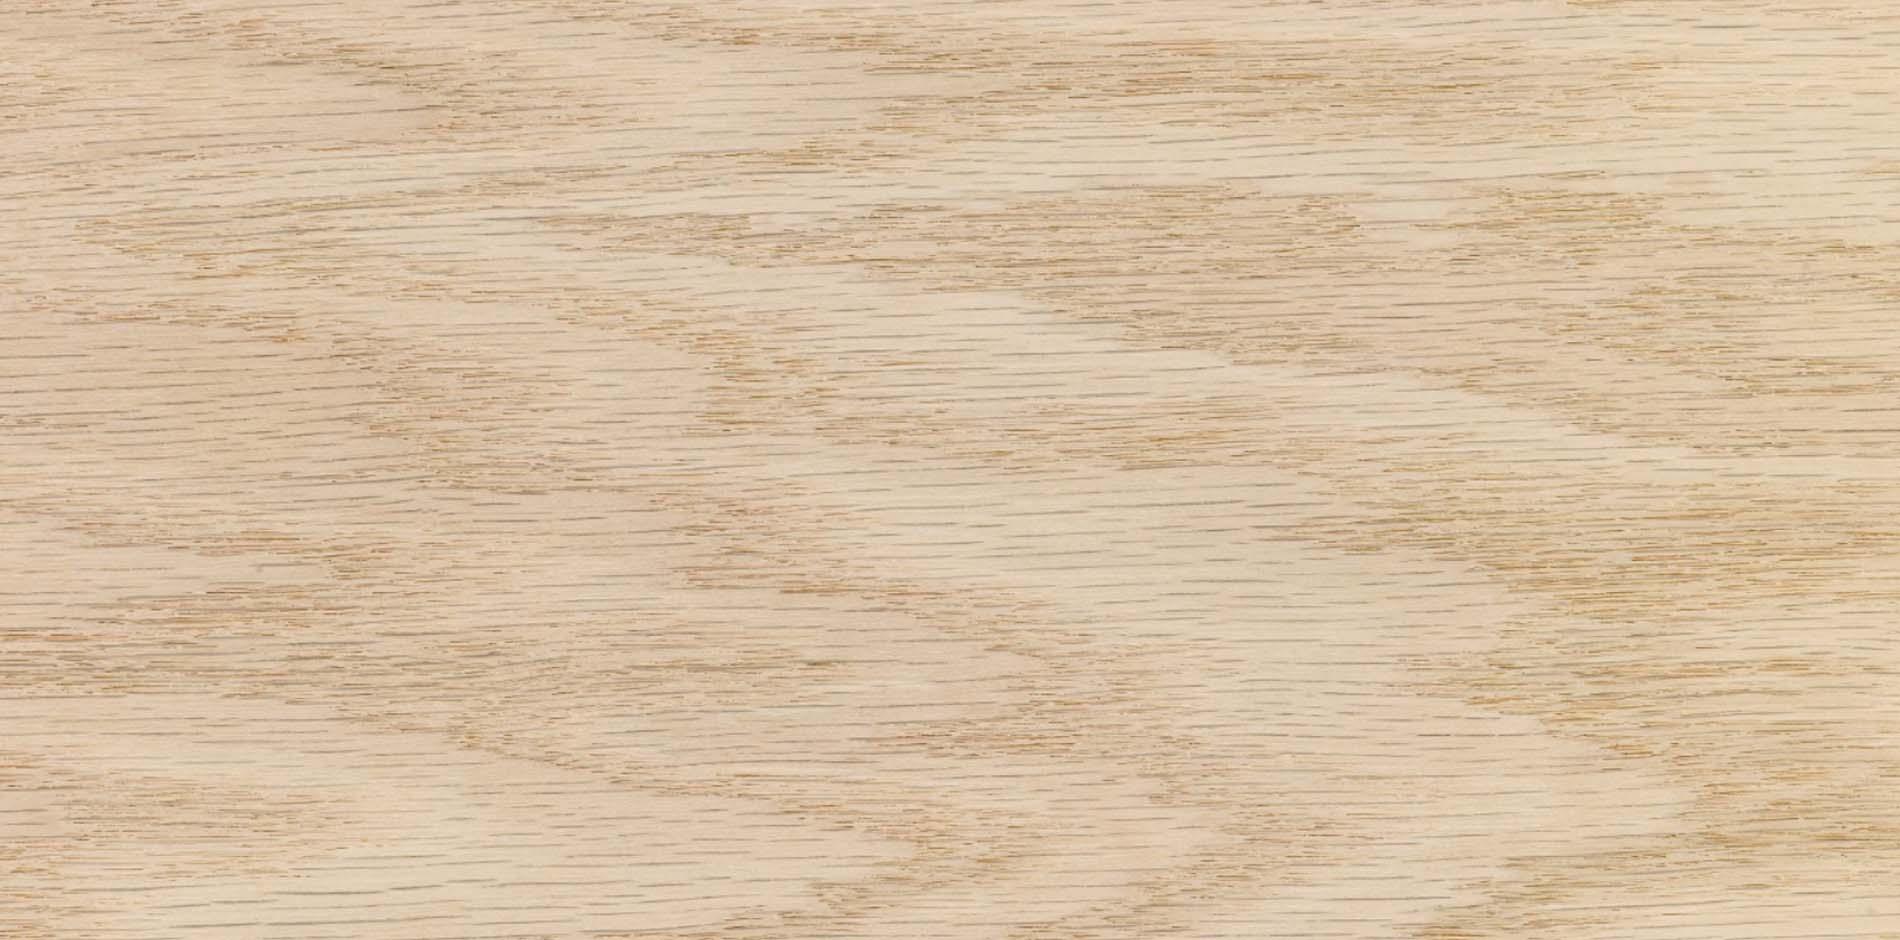 garnica_plywood_red_oak_3